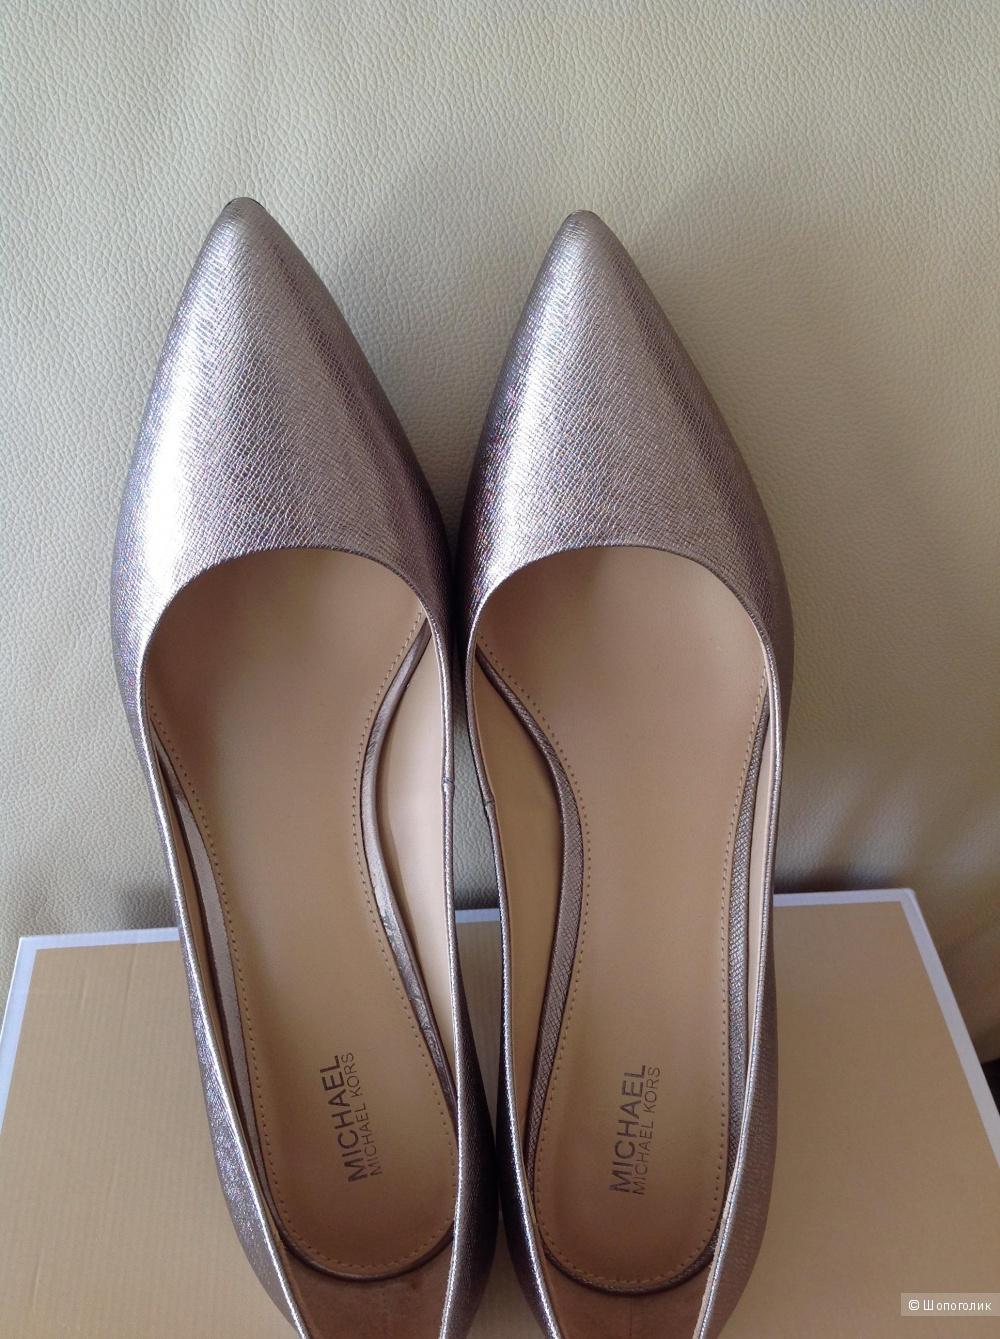 Туфли Michael kors, размер 9,5, на 39-40